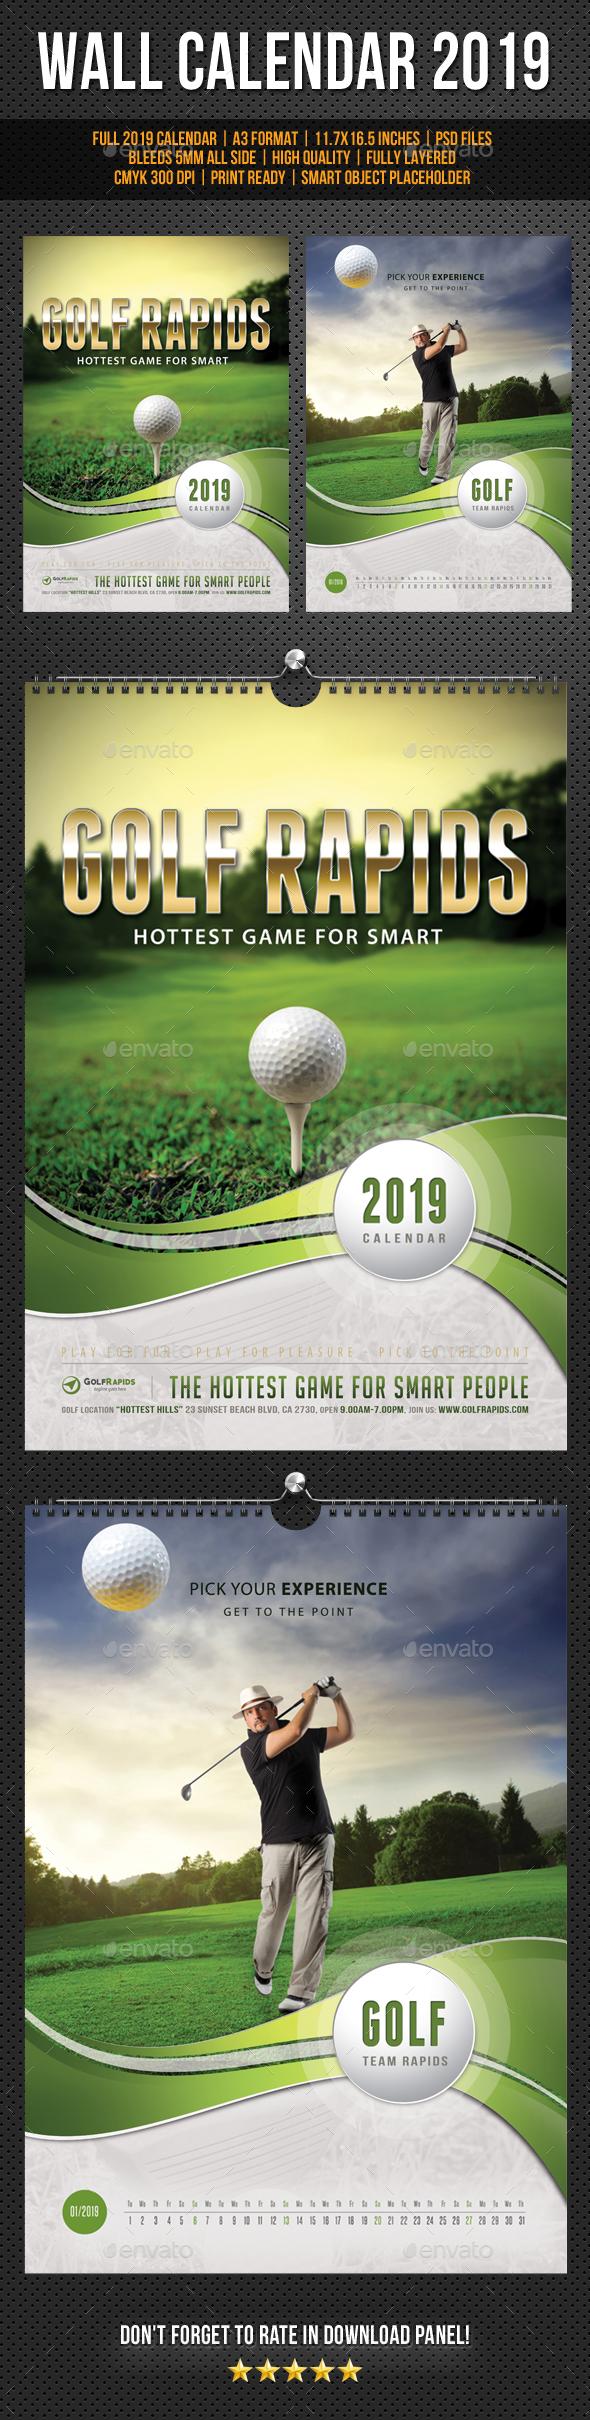 Golf Play Wall Calendar A3 2019 - Calendars Stationery